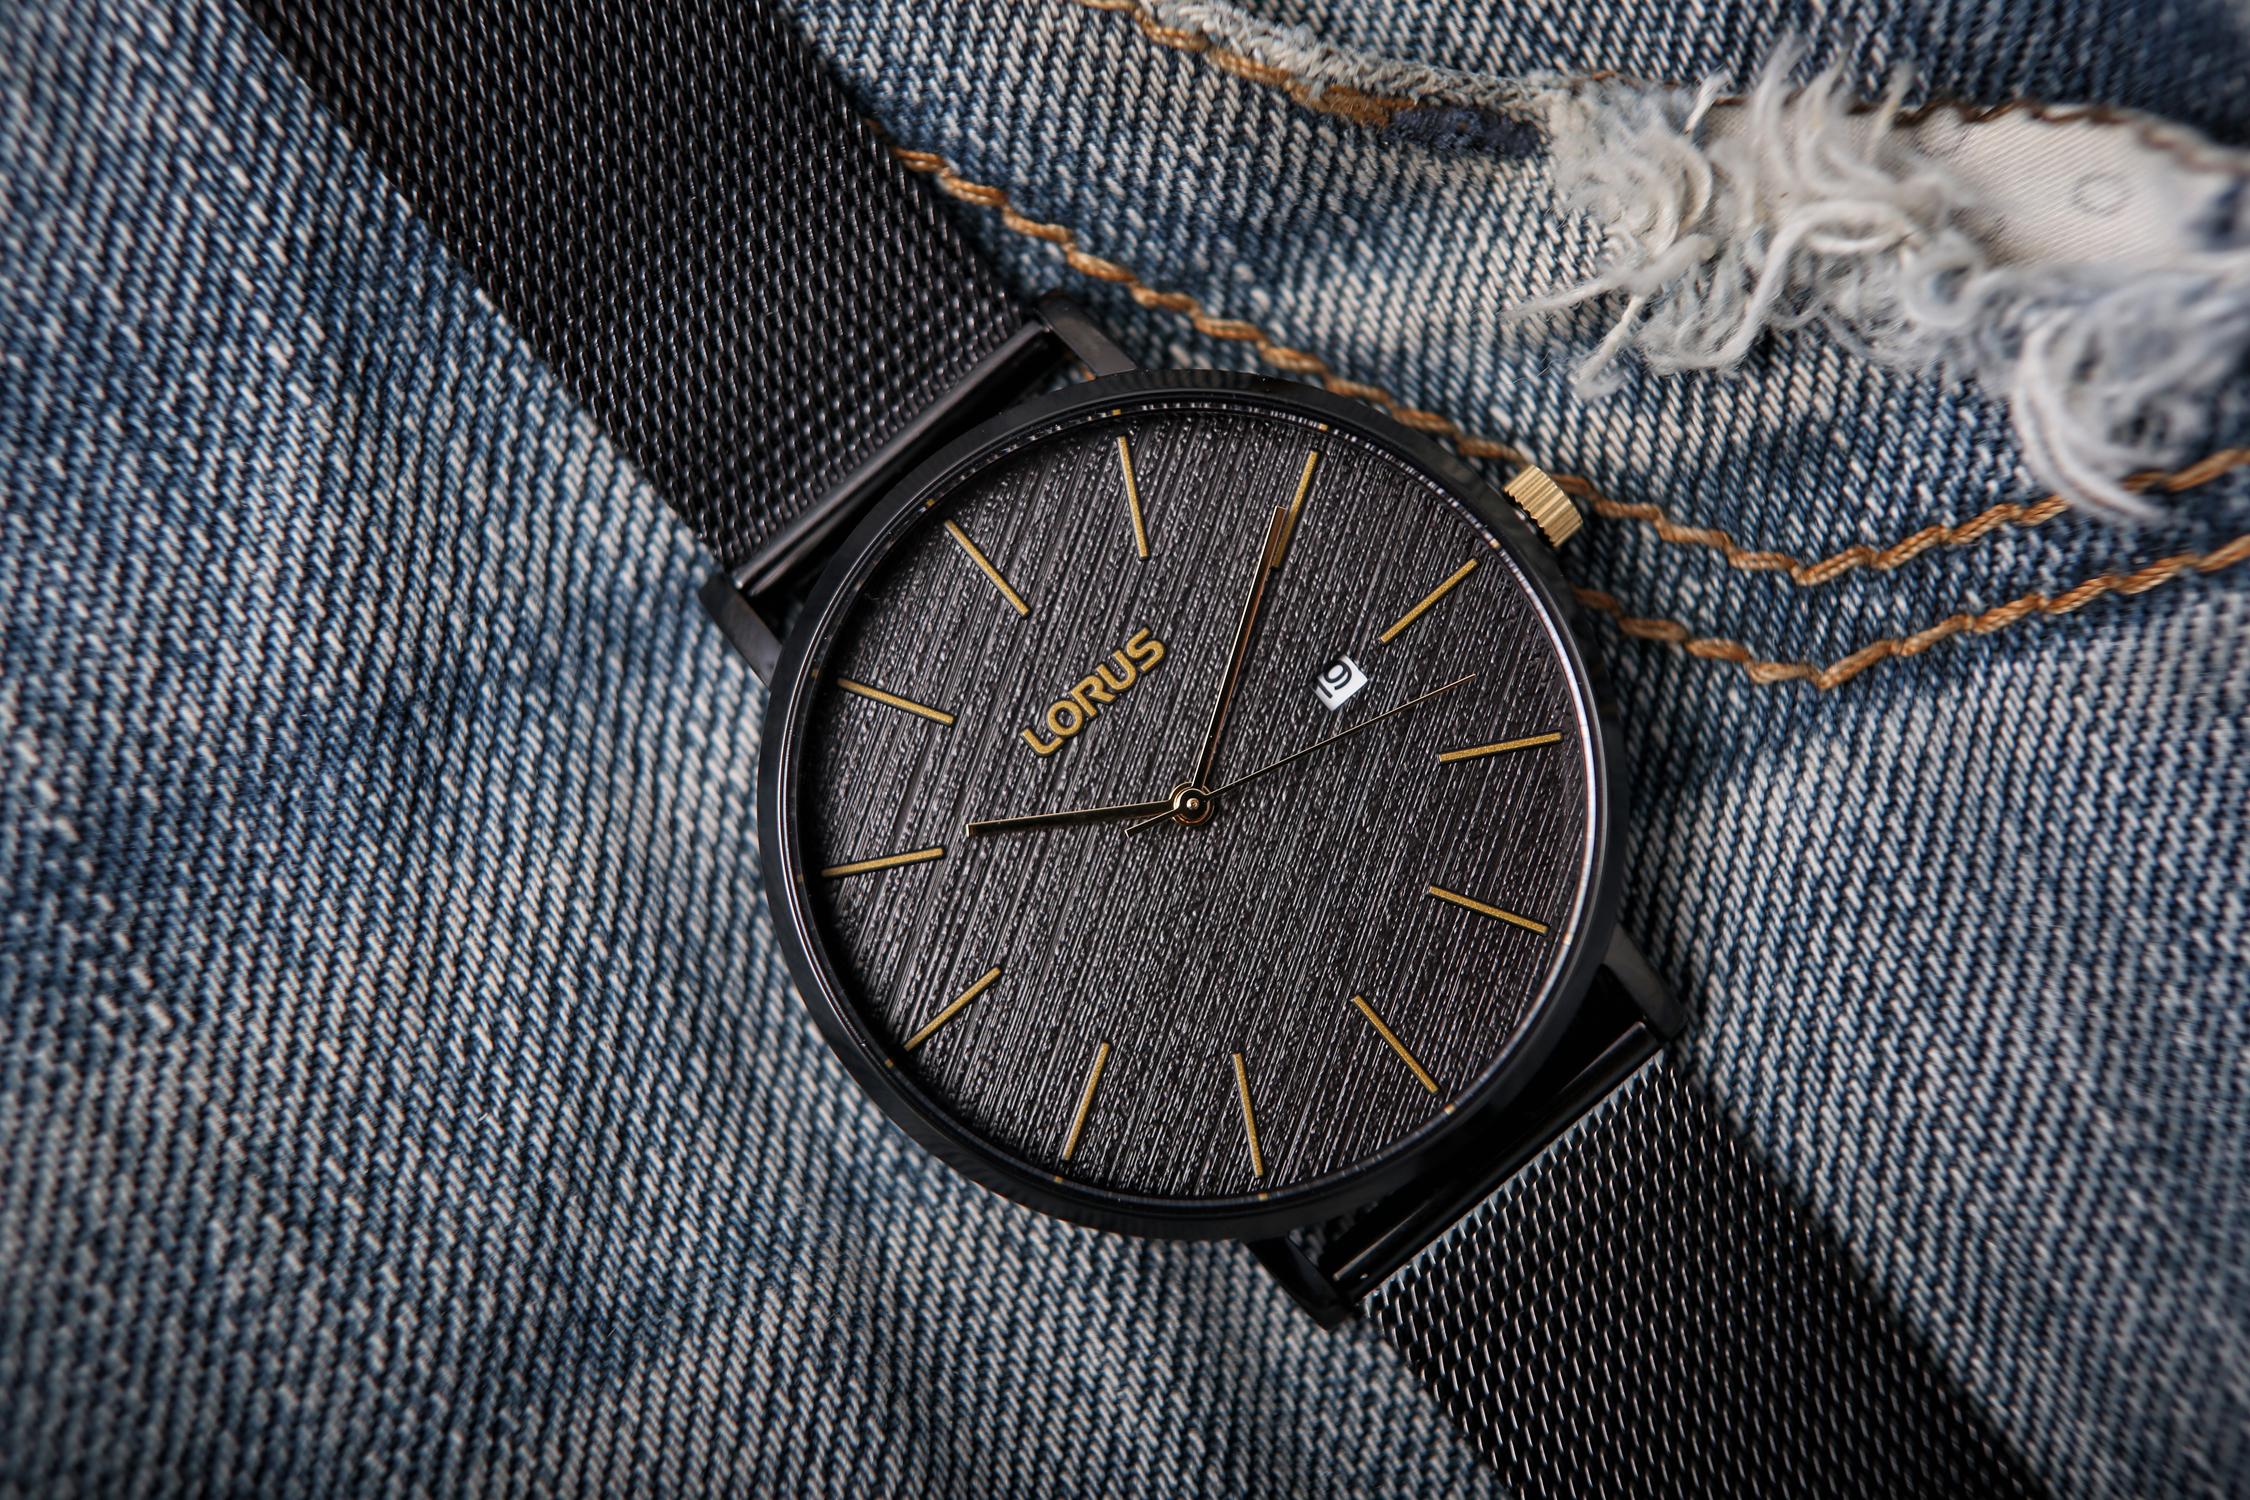 Zegarek damski Lorus klasyczne RG211QX9 - duże 6